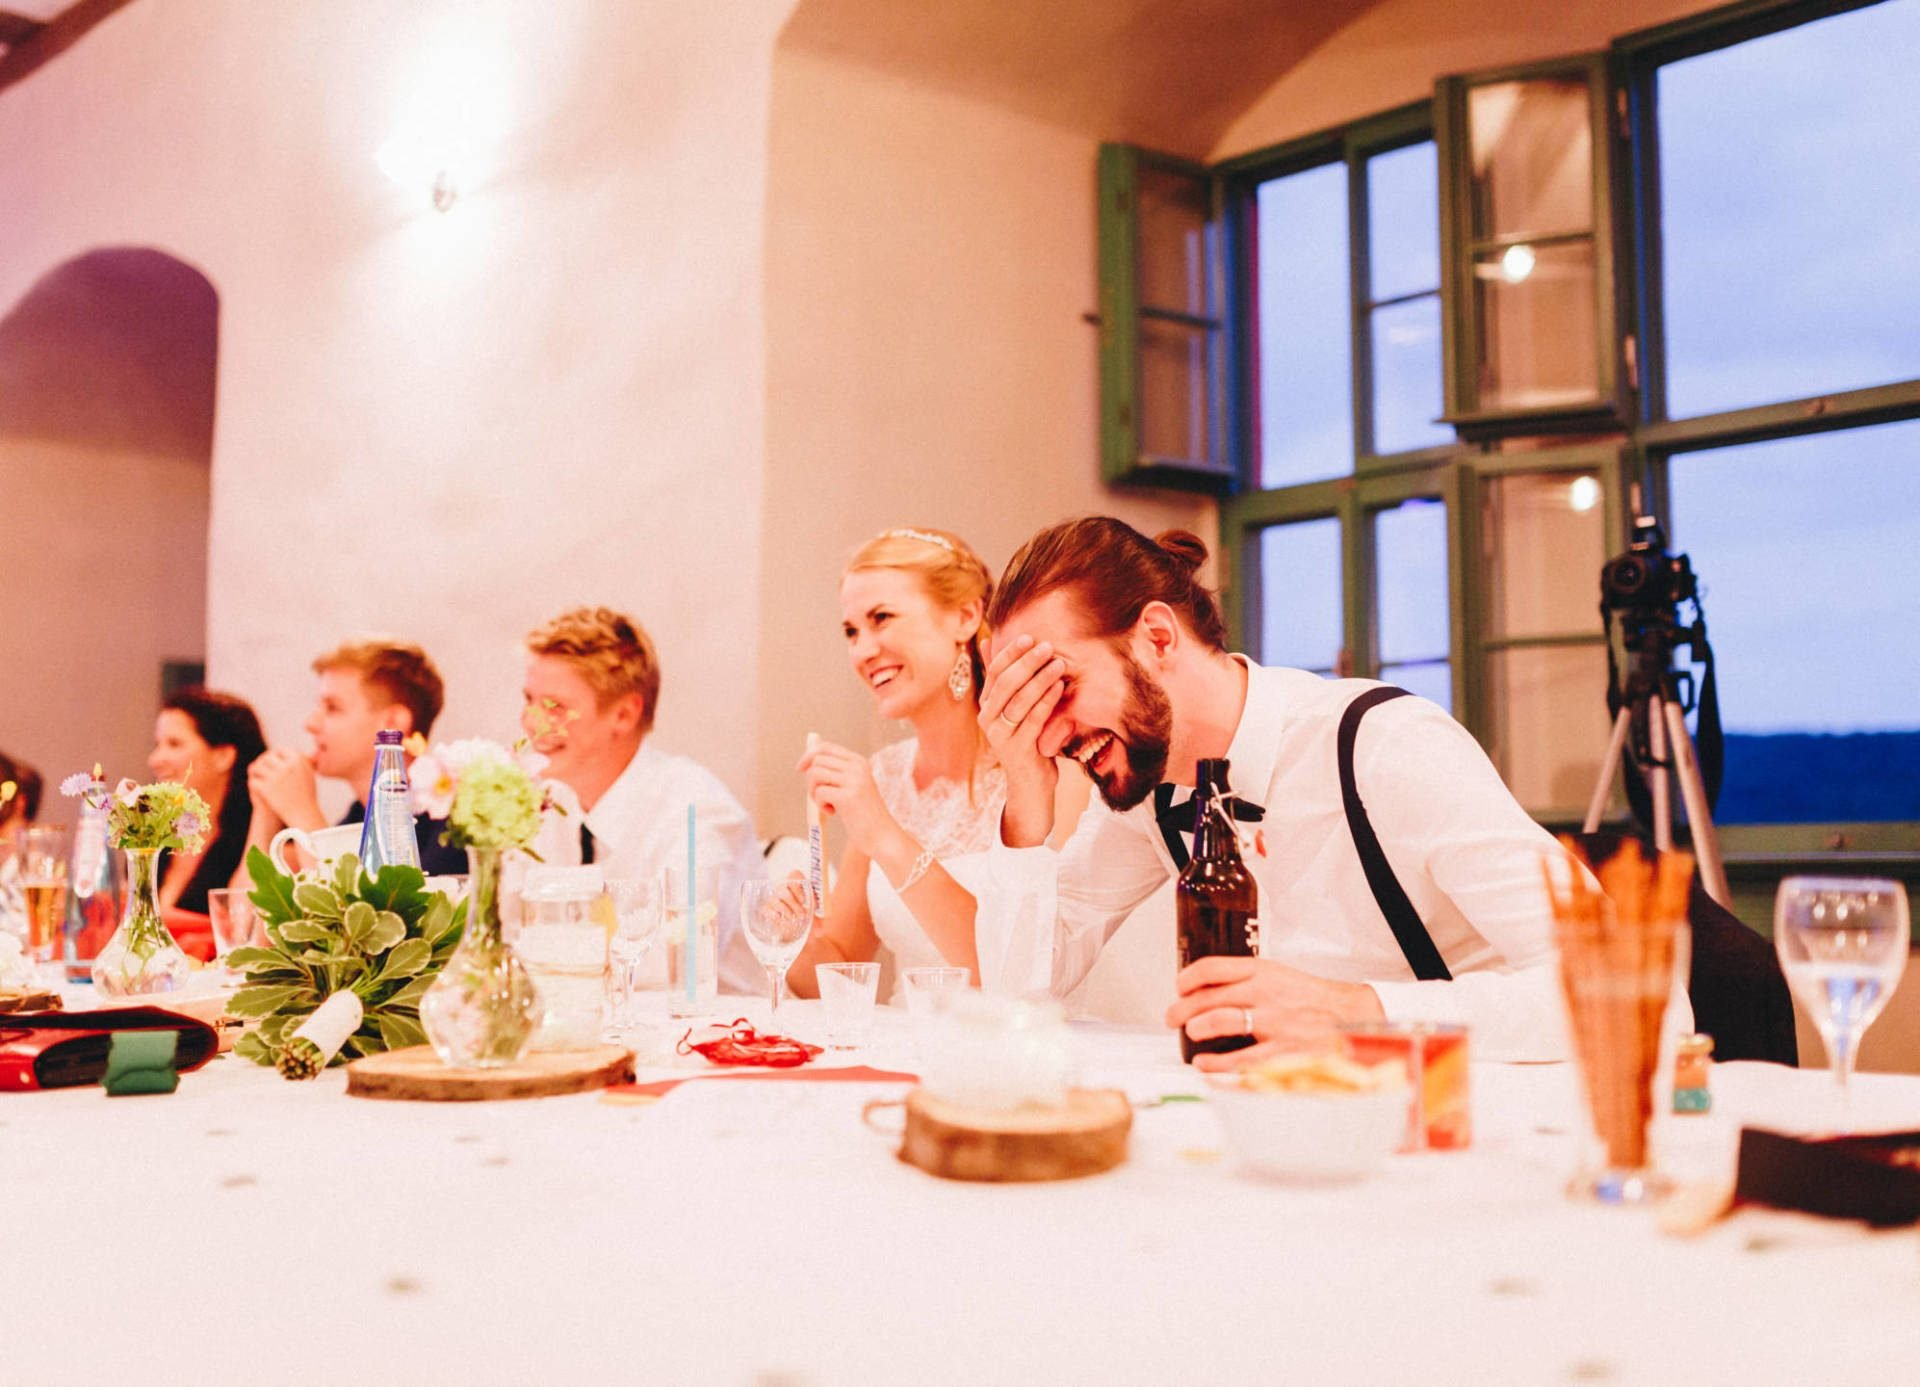 JuleSascha 53 1920x1387 - Hochzeit im alten Dornburger Schloss